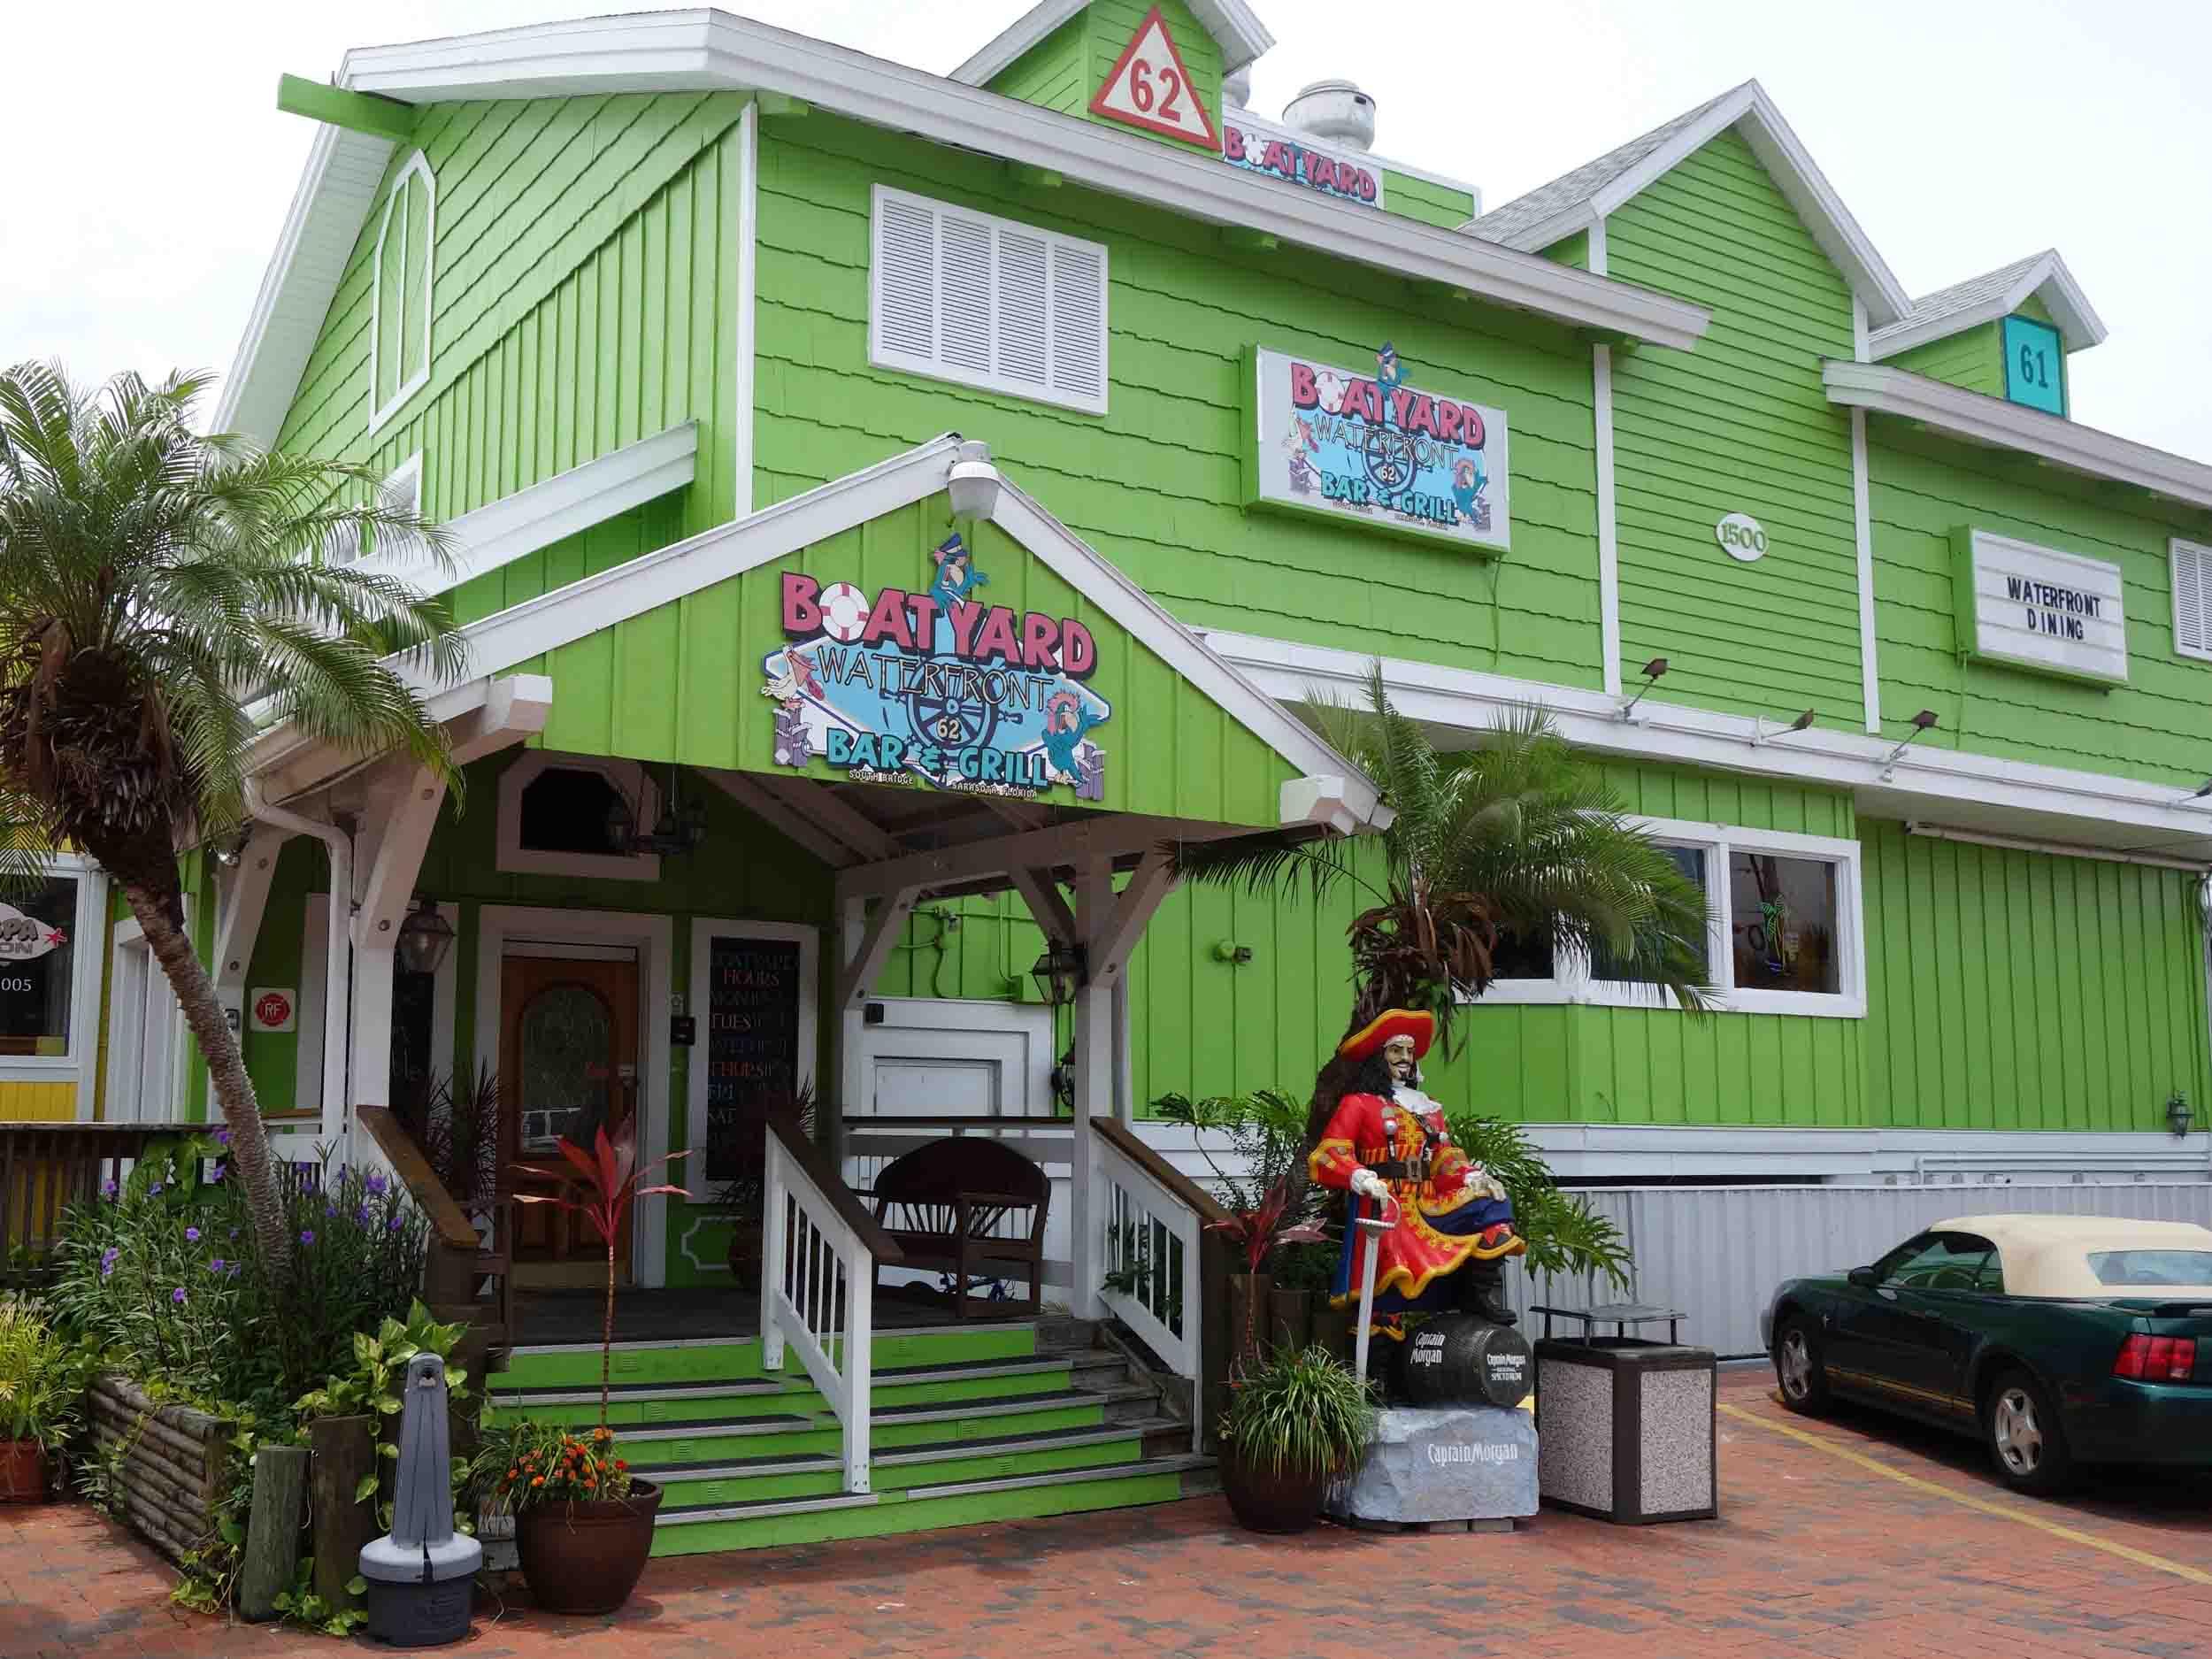 Boatyard Waterfront Bar and Grill Entrance